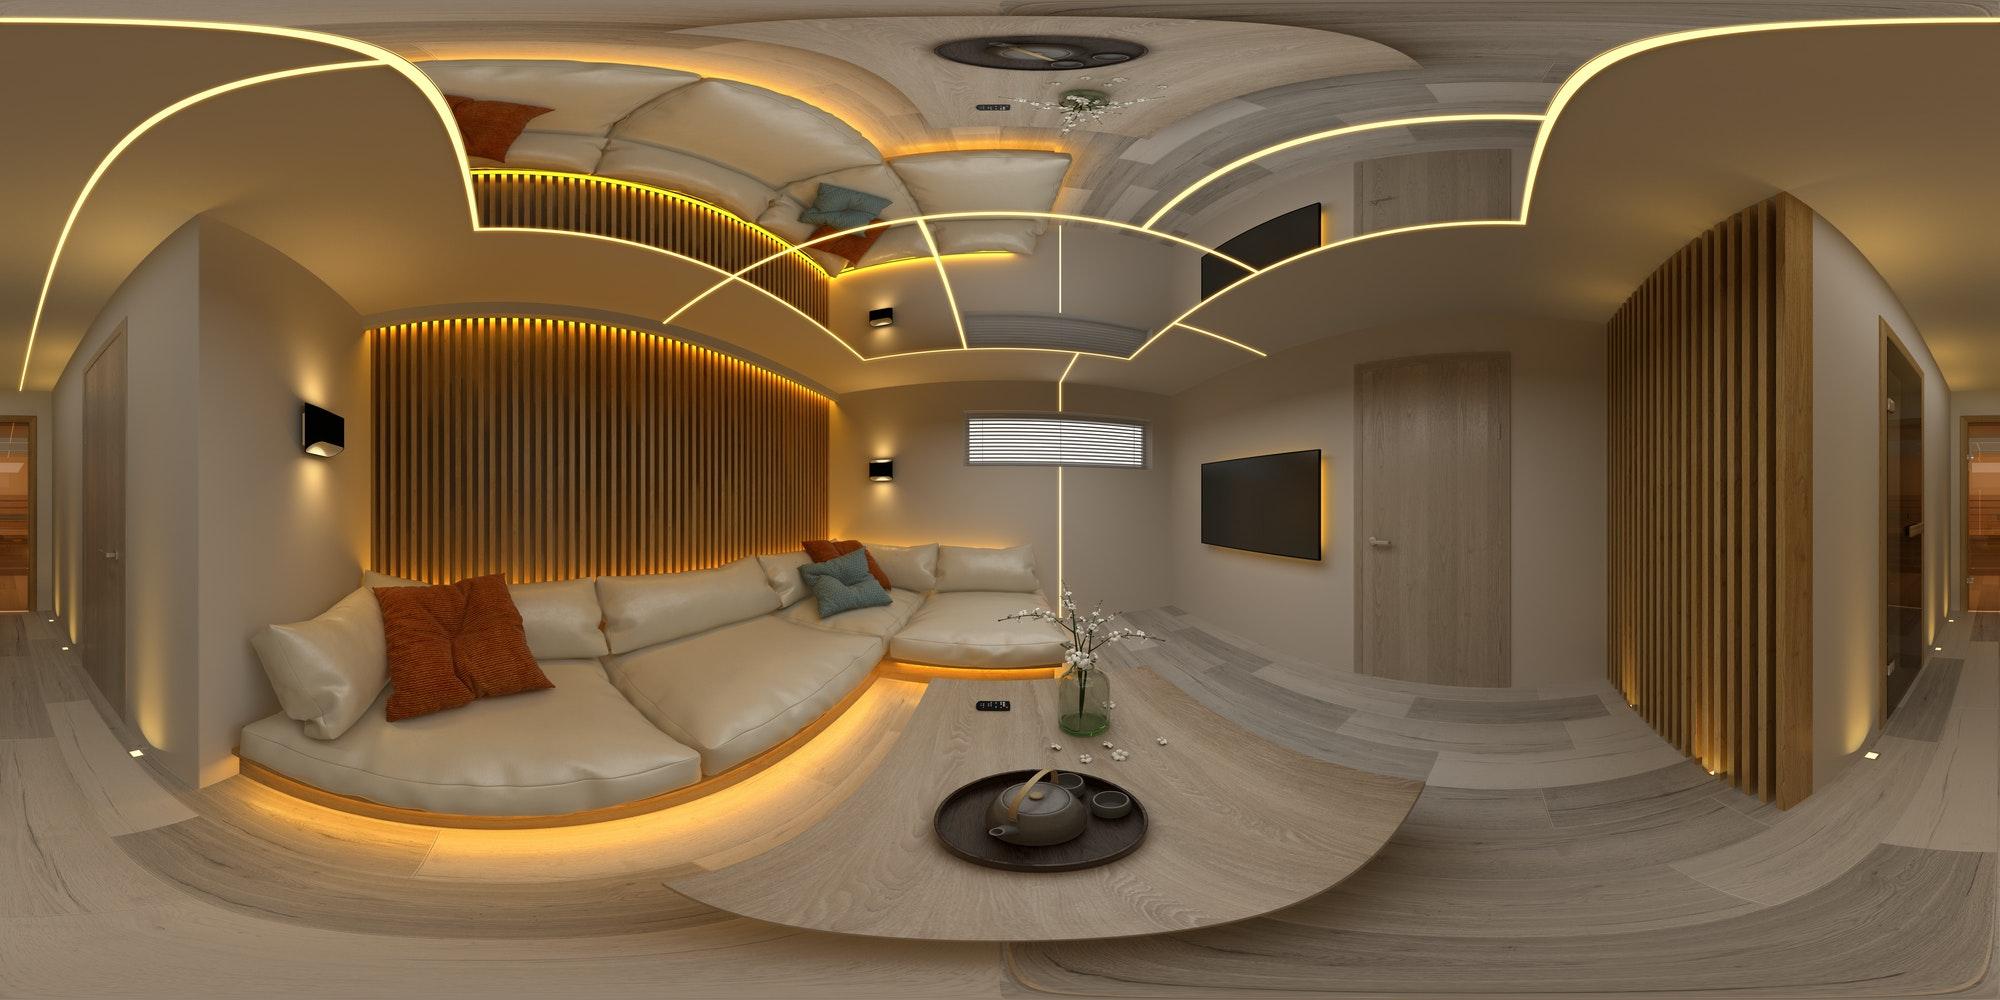 Spherical 360 seamless panorama projection Interior modern design room 3D illustration